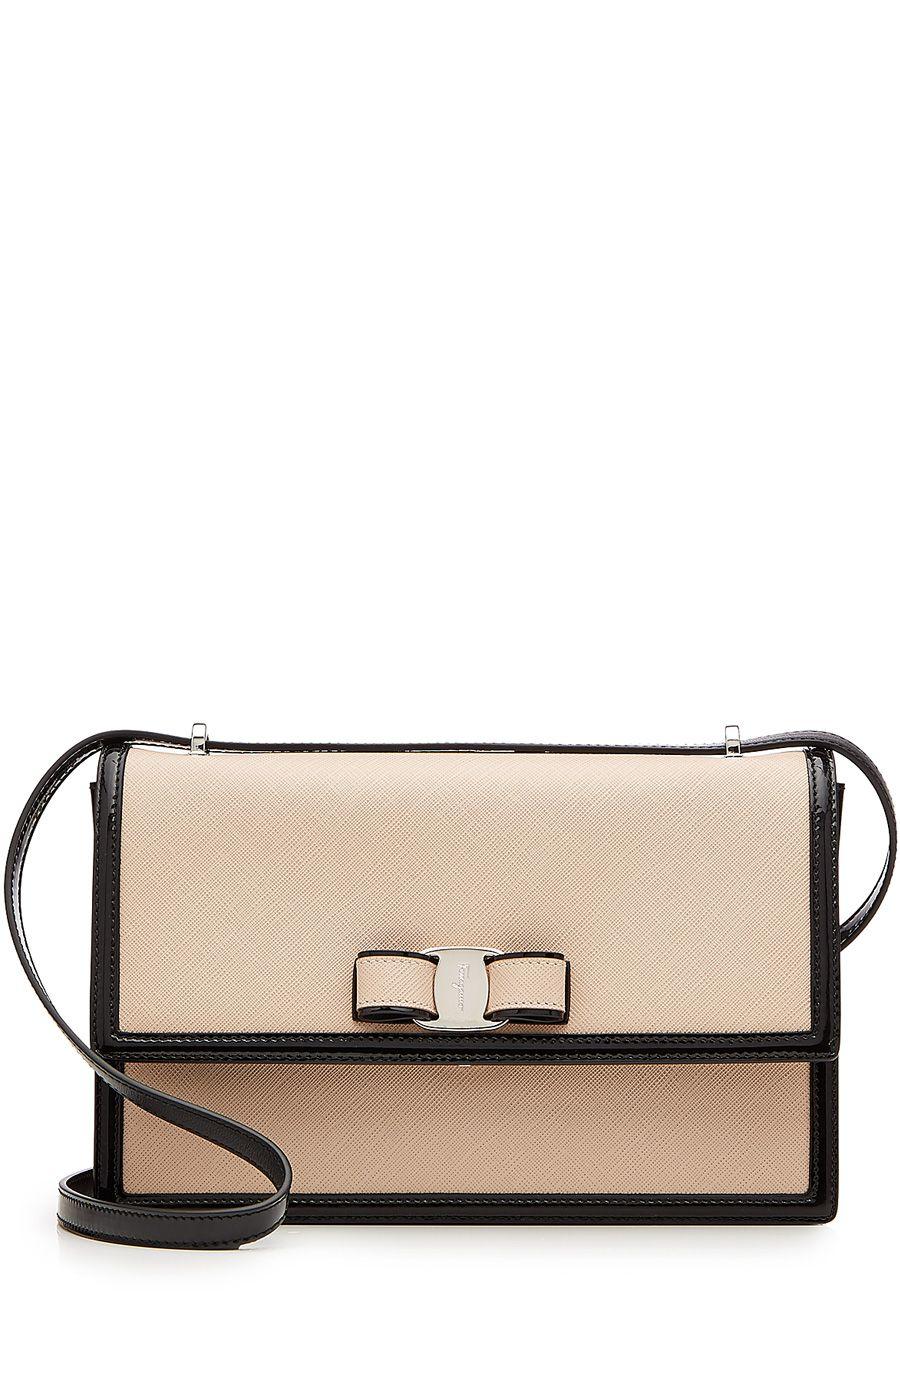 e0251f8f9d51 SALVATORE FERRAGAMO Leather Medium Ginny Shoulder Bag.  salvatoreferragamo   bags  shoulder bags  hand bags  patent